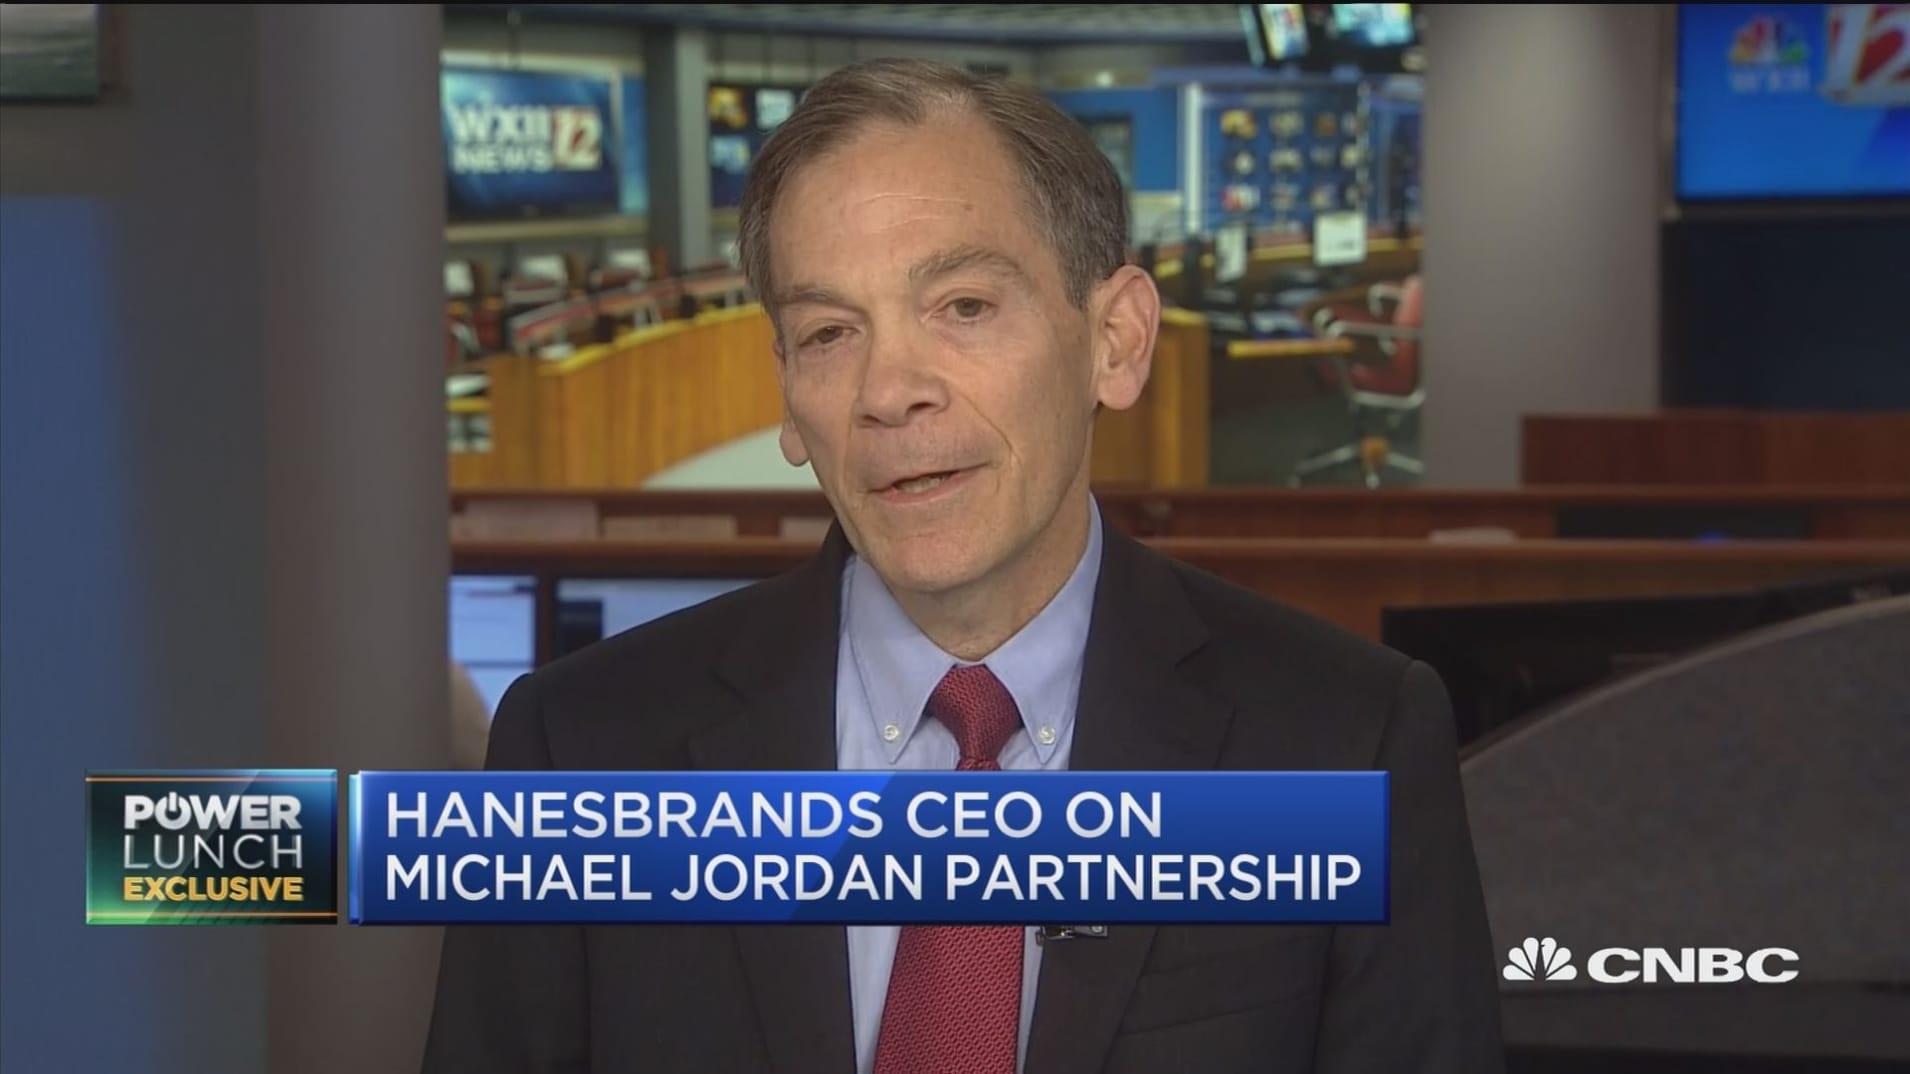 Hanesbrands CEO Gerald Evans discusses Michael Jordan partnership